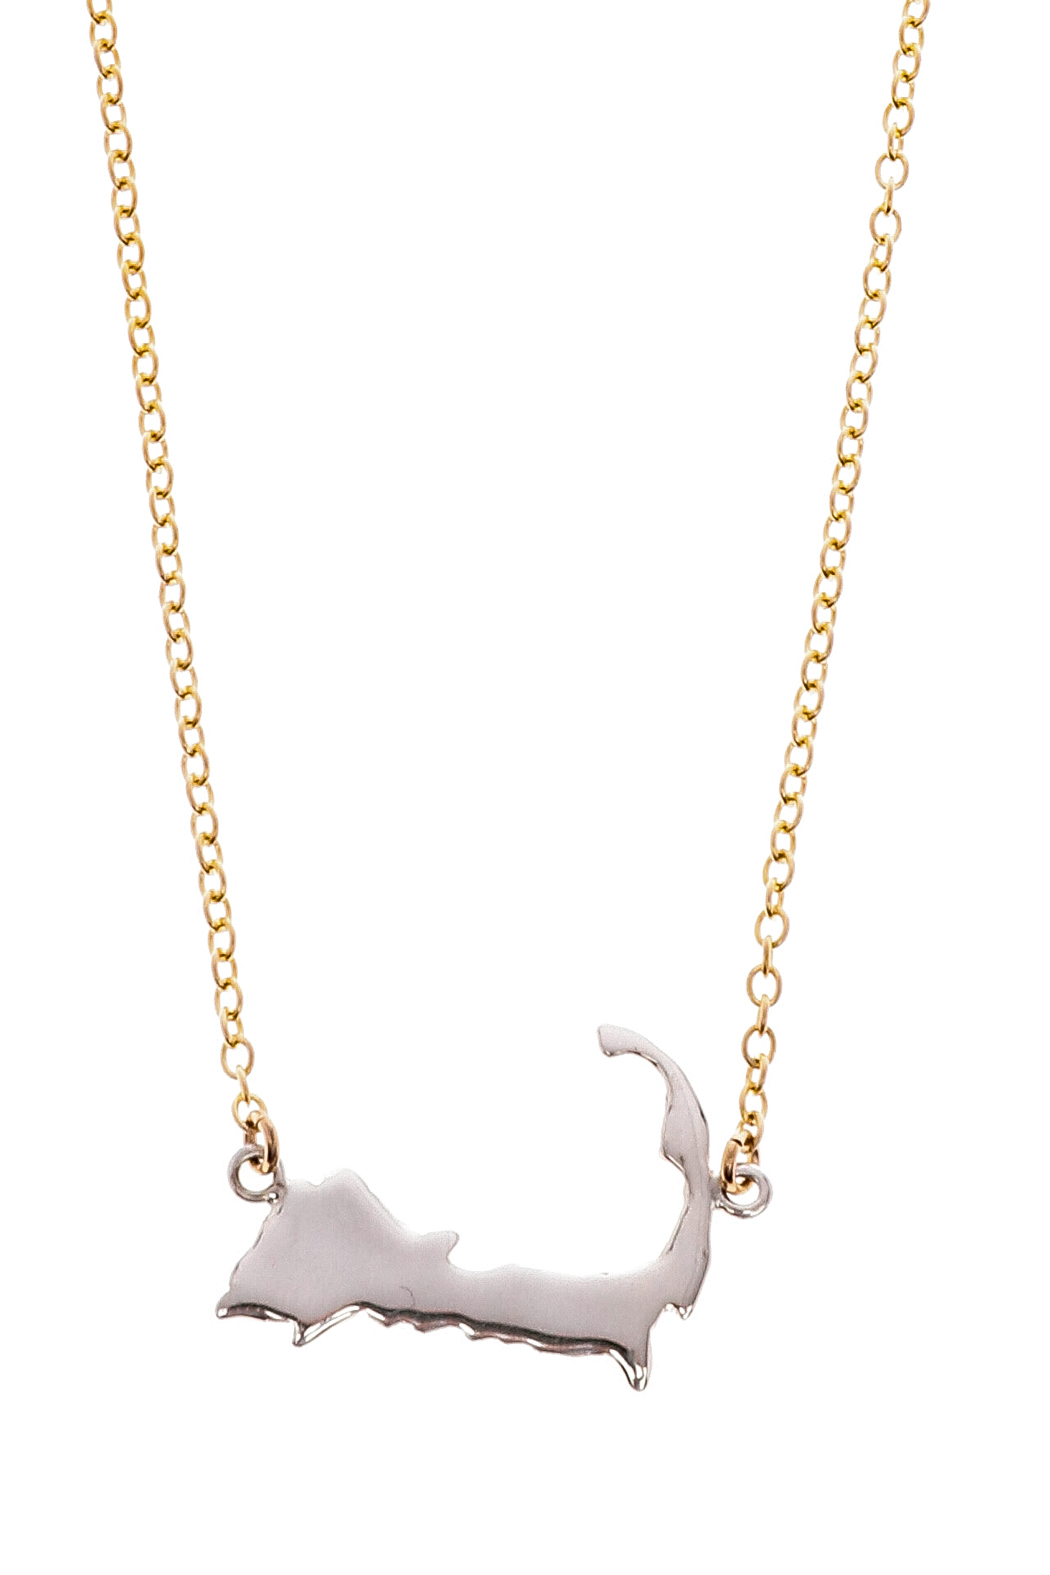 1050x1575 Jewelry Studio Of Wellfleet Two Toned Silhouette Necklace